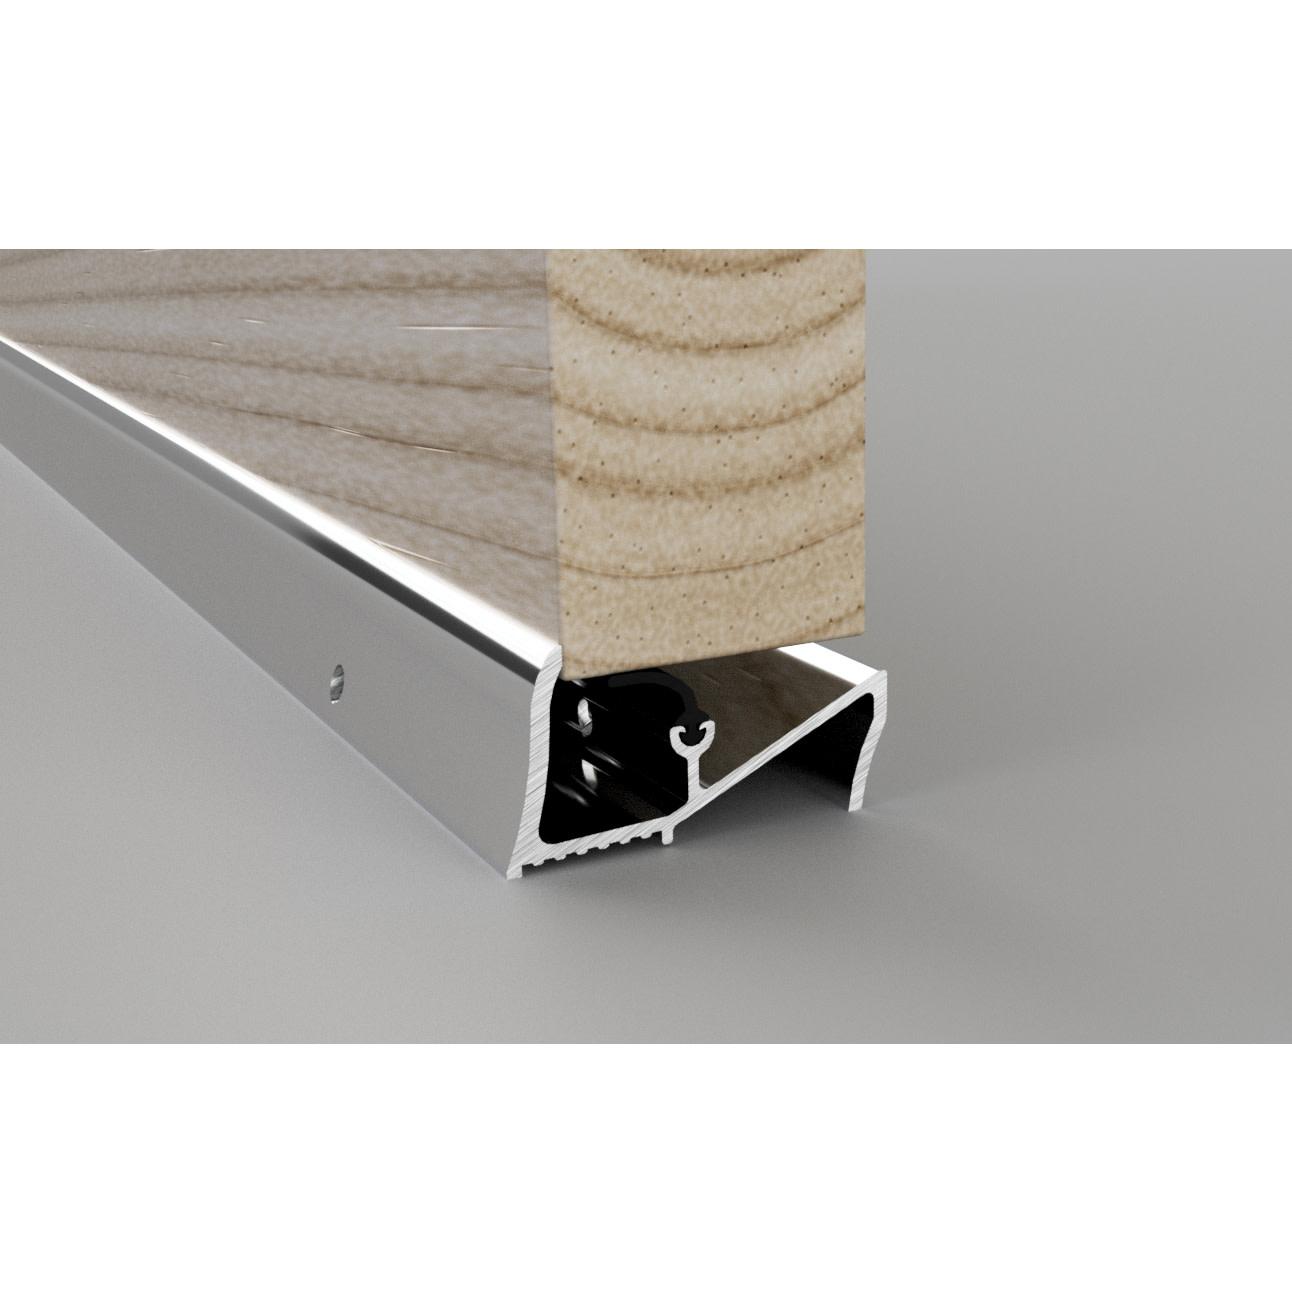 Stormguard Lowline Threshold - 2000mm - Silver)